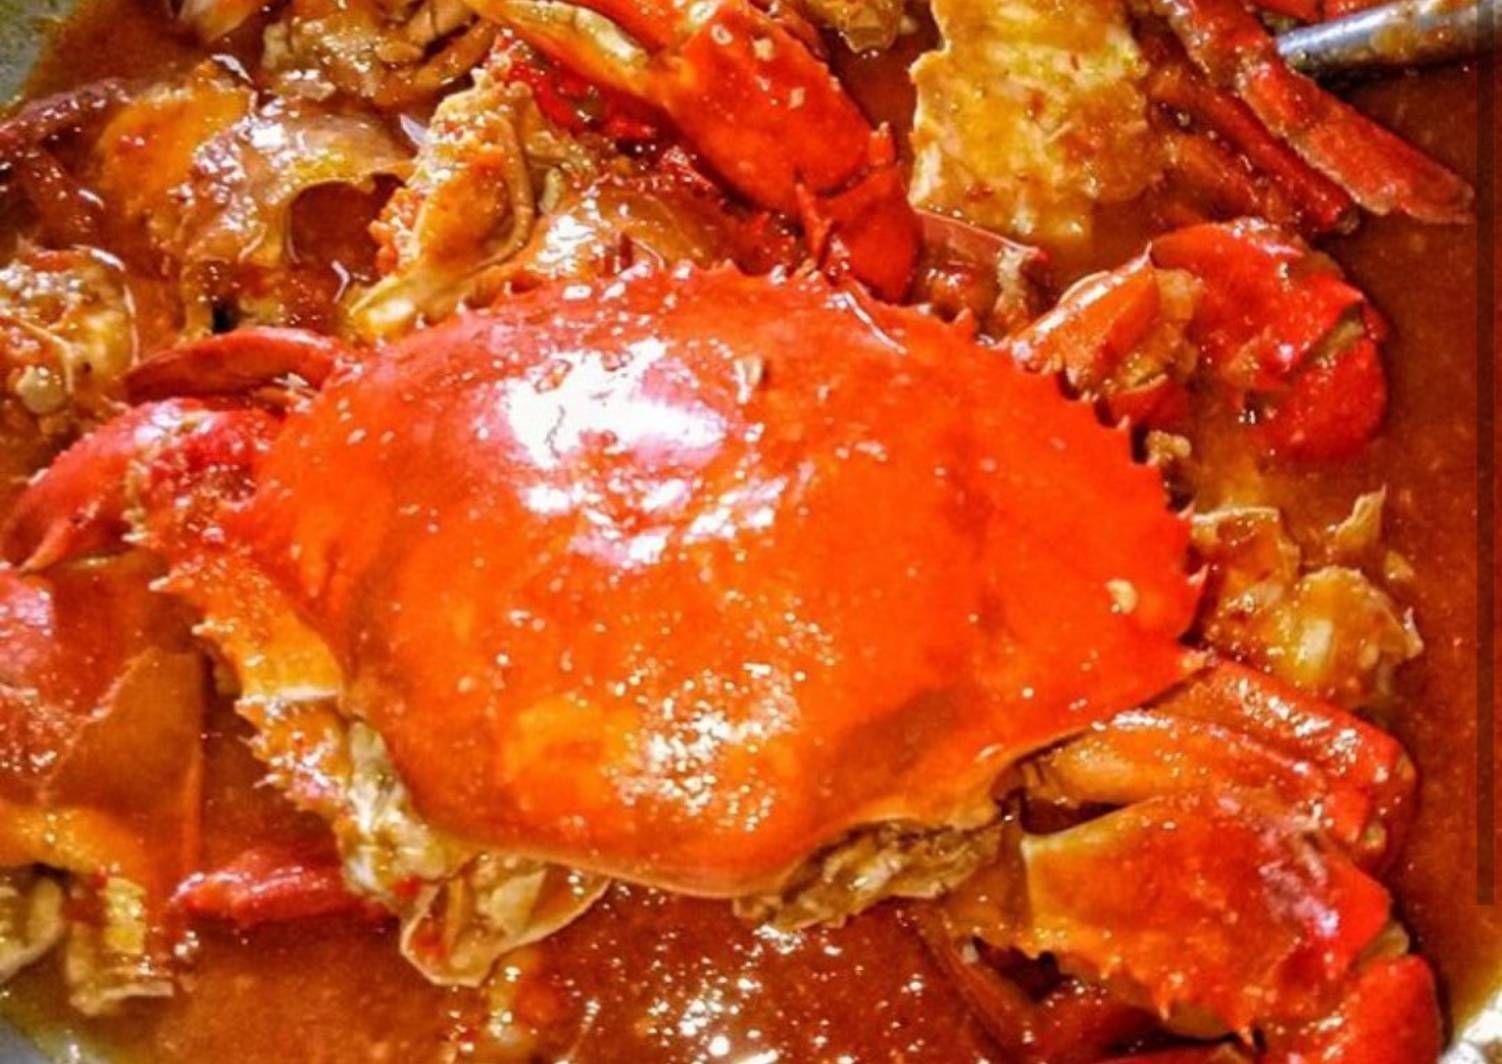 Resep Kepiting Pedas Saos Padang Oleh Harani Fd Resep Resep Kepiting Kepiting Resep Makanan Asia